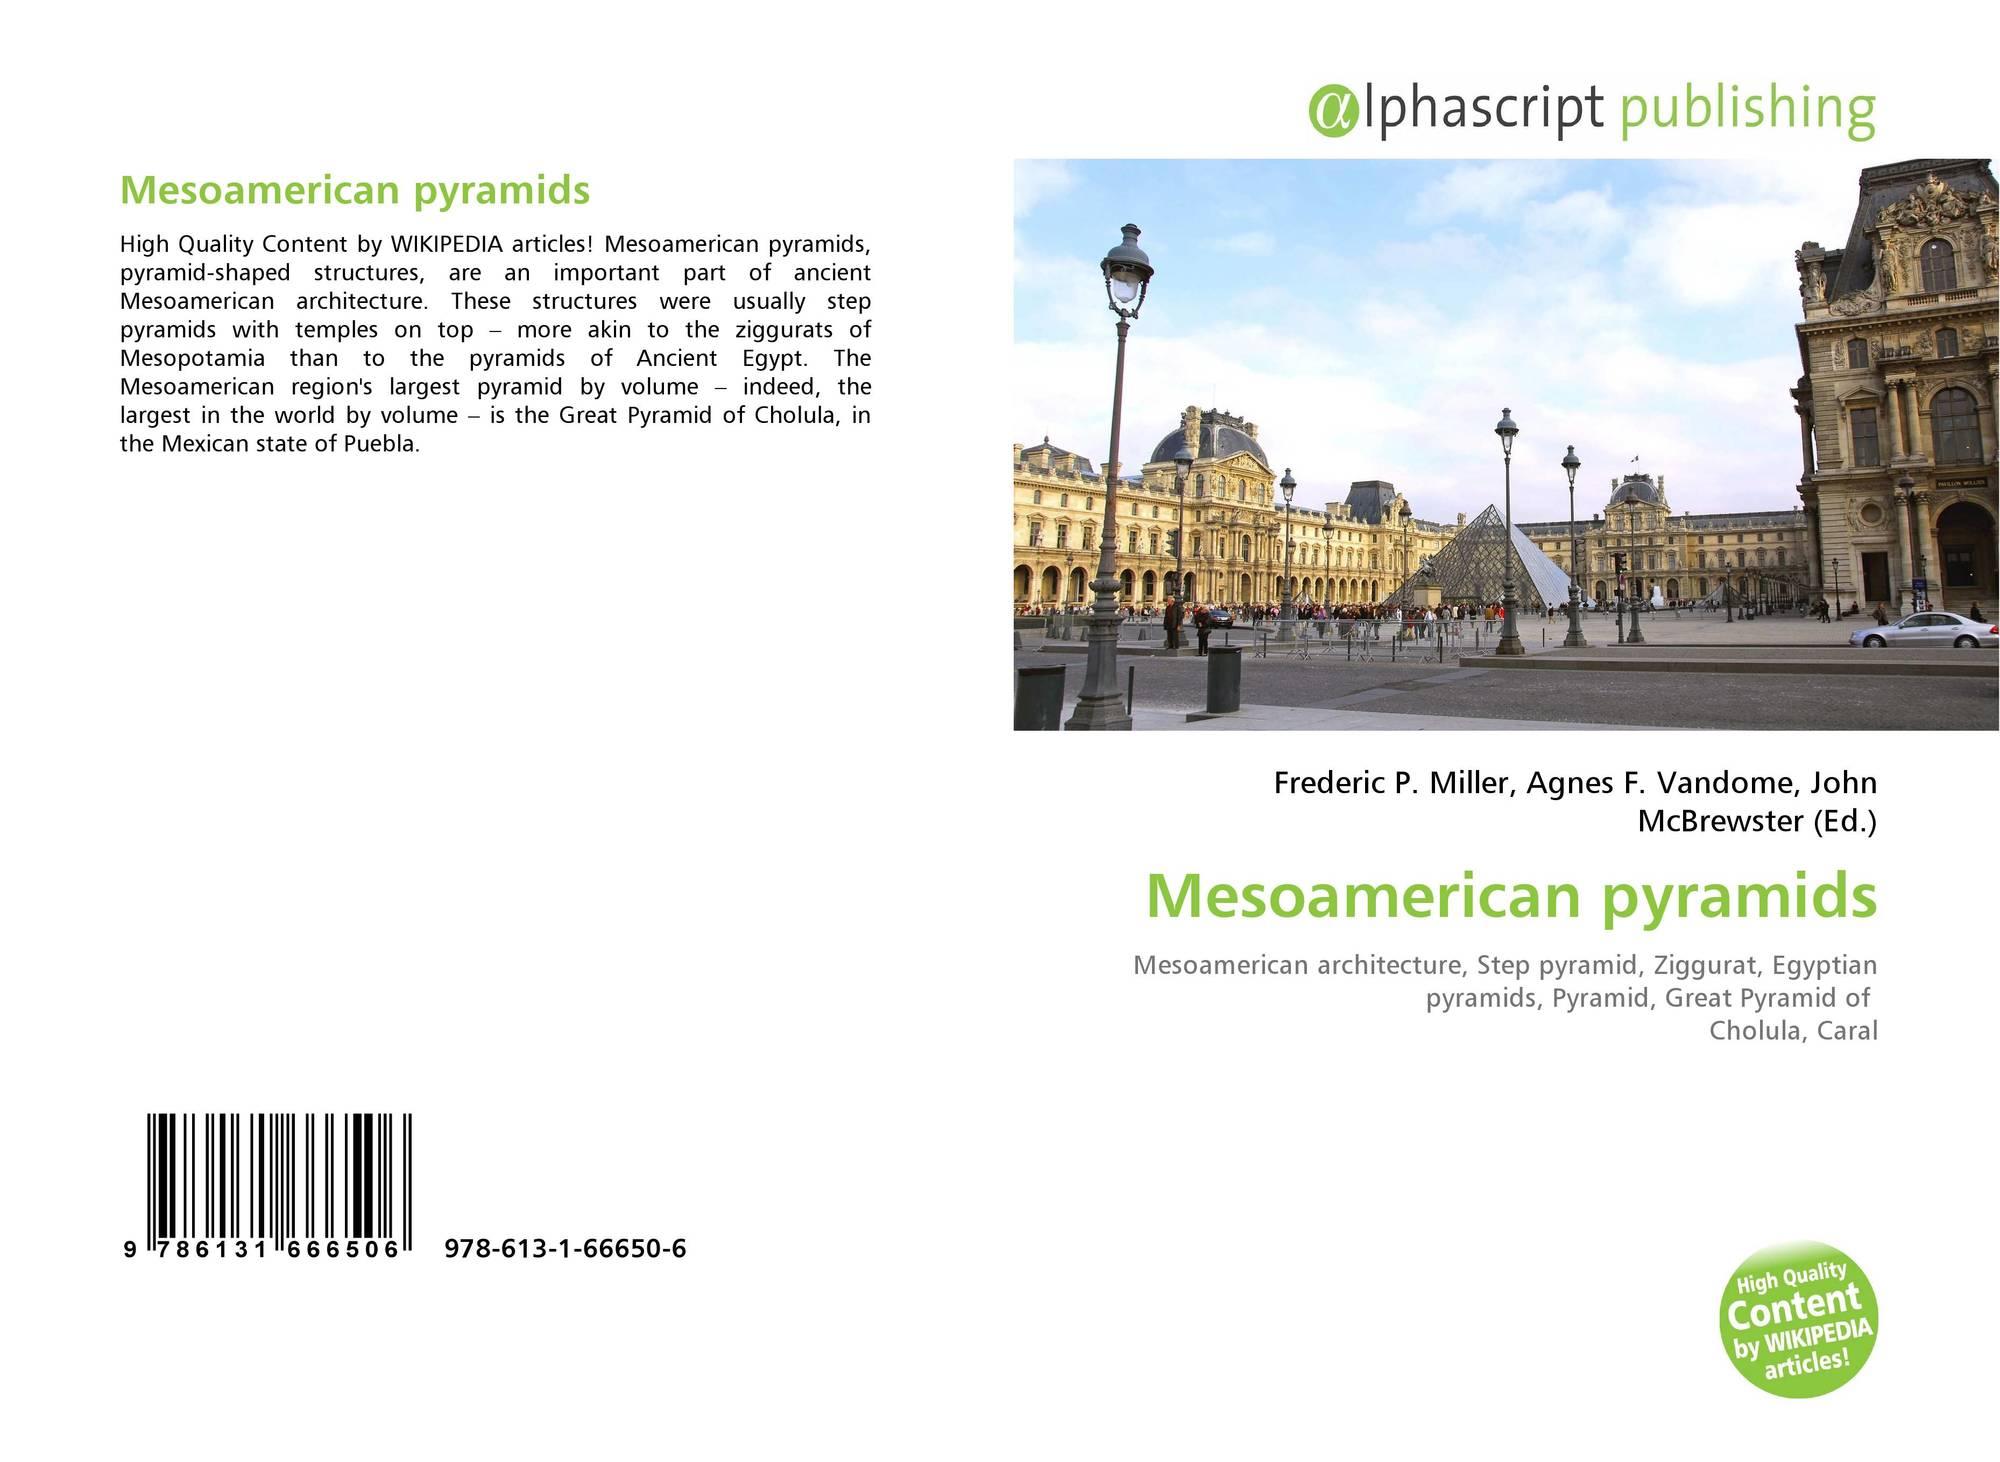 Mesoamerican pyramids, 978-613-1-66650-6, 6131666504